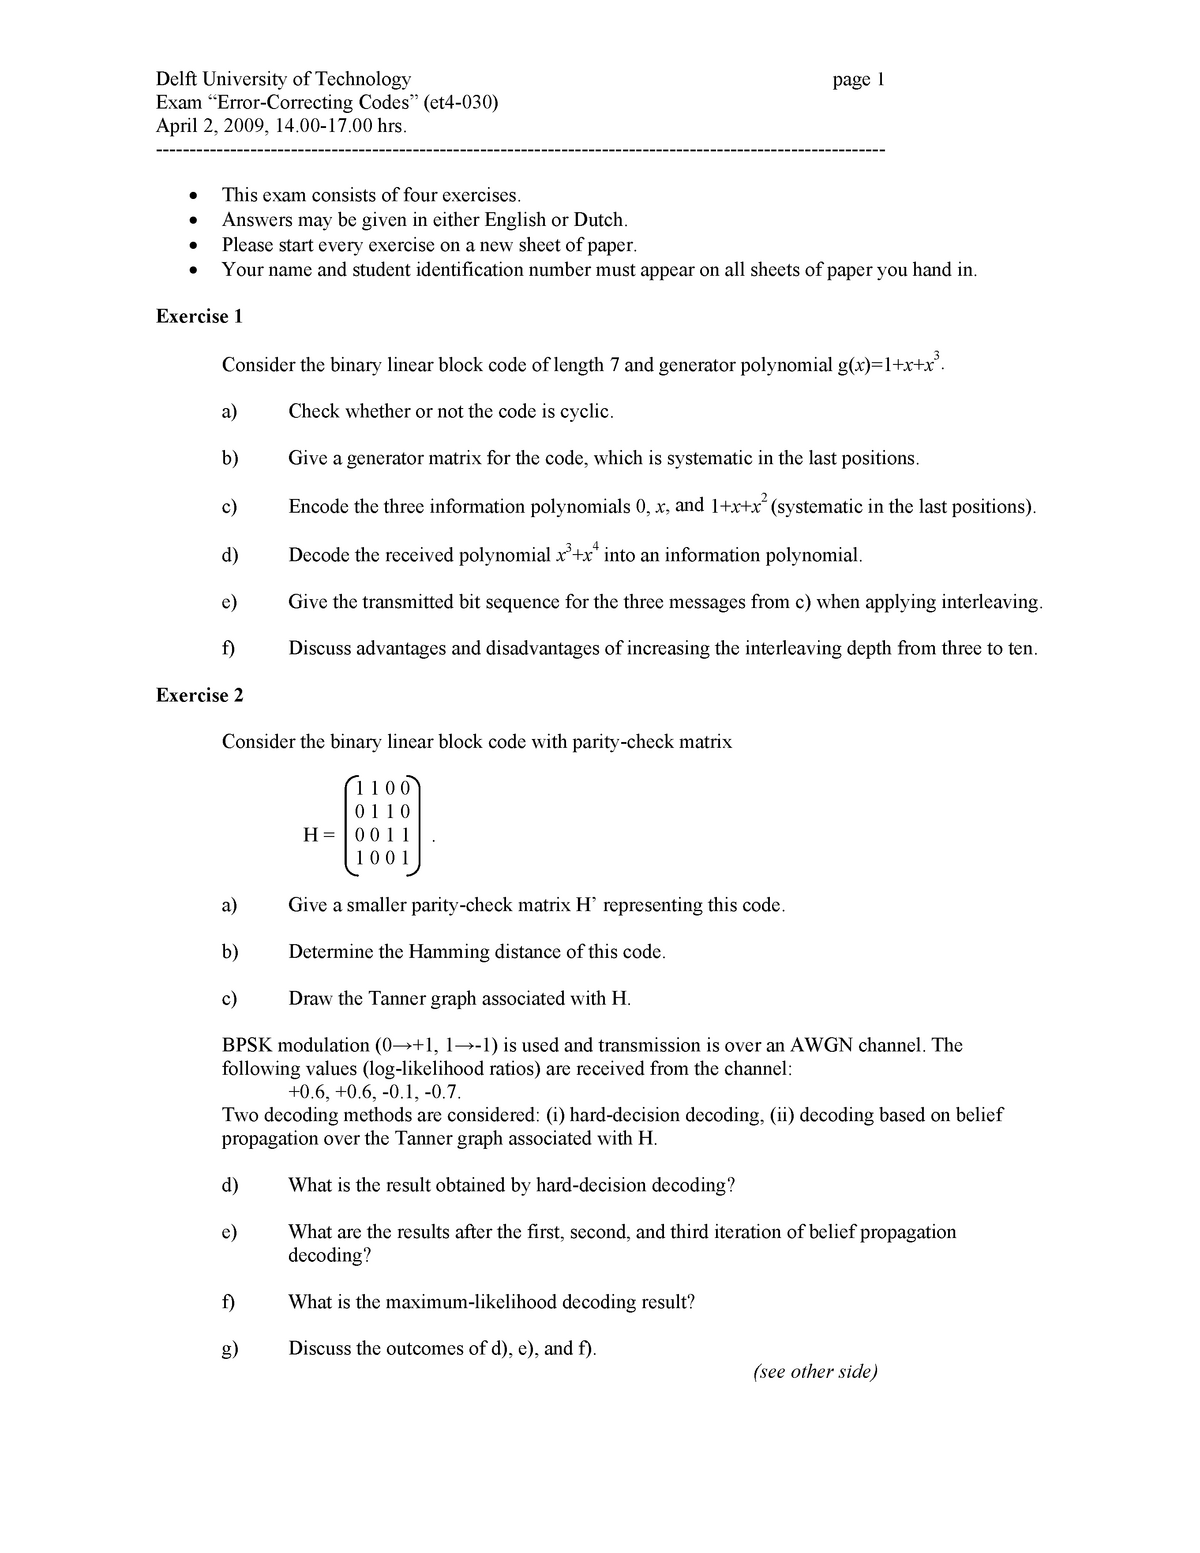 Tenta 2009 - ET4030 :Error Correcting Codes - StuDocu